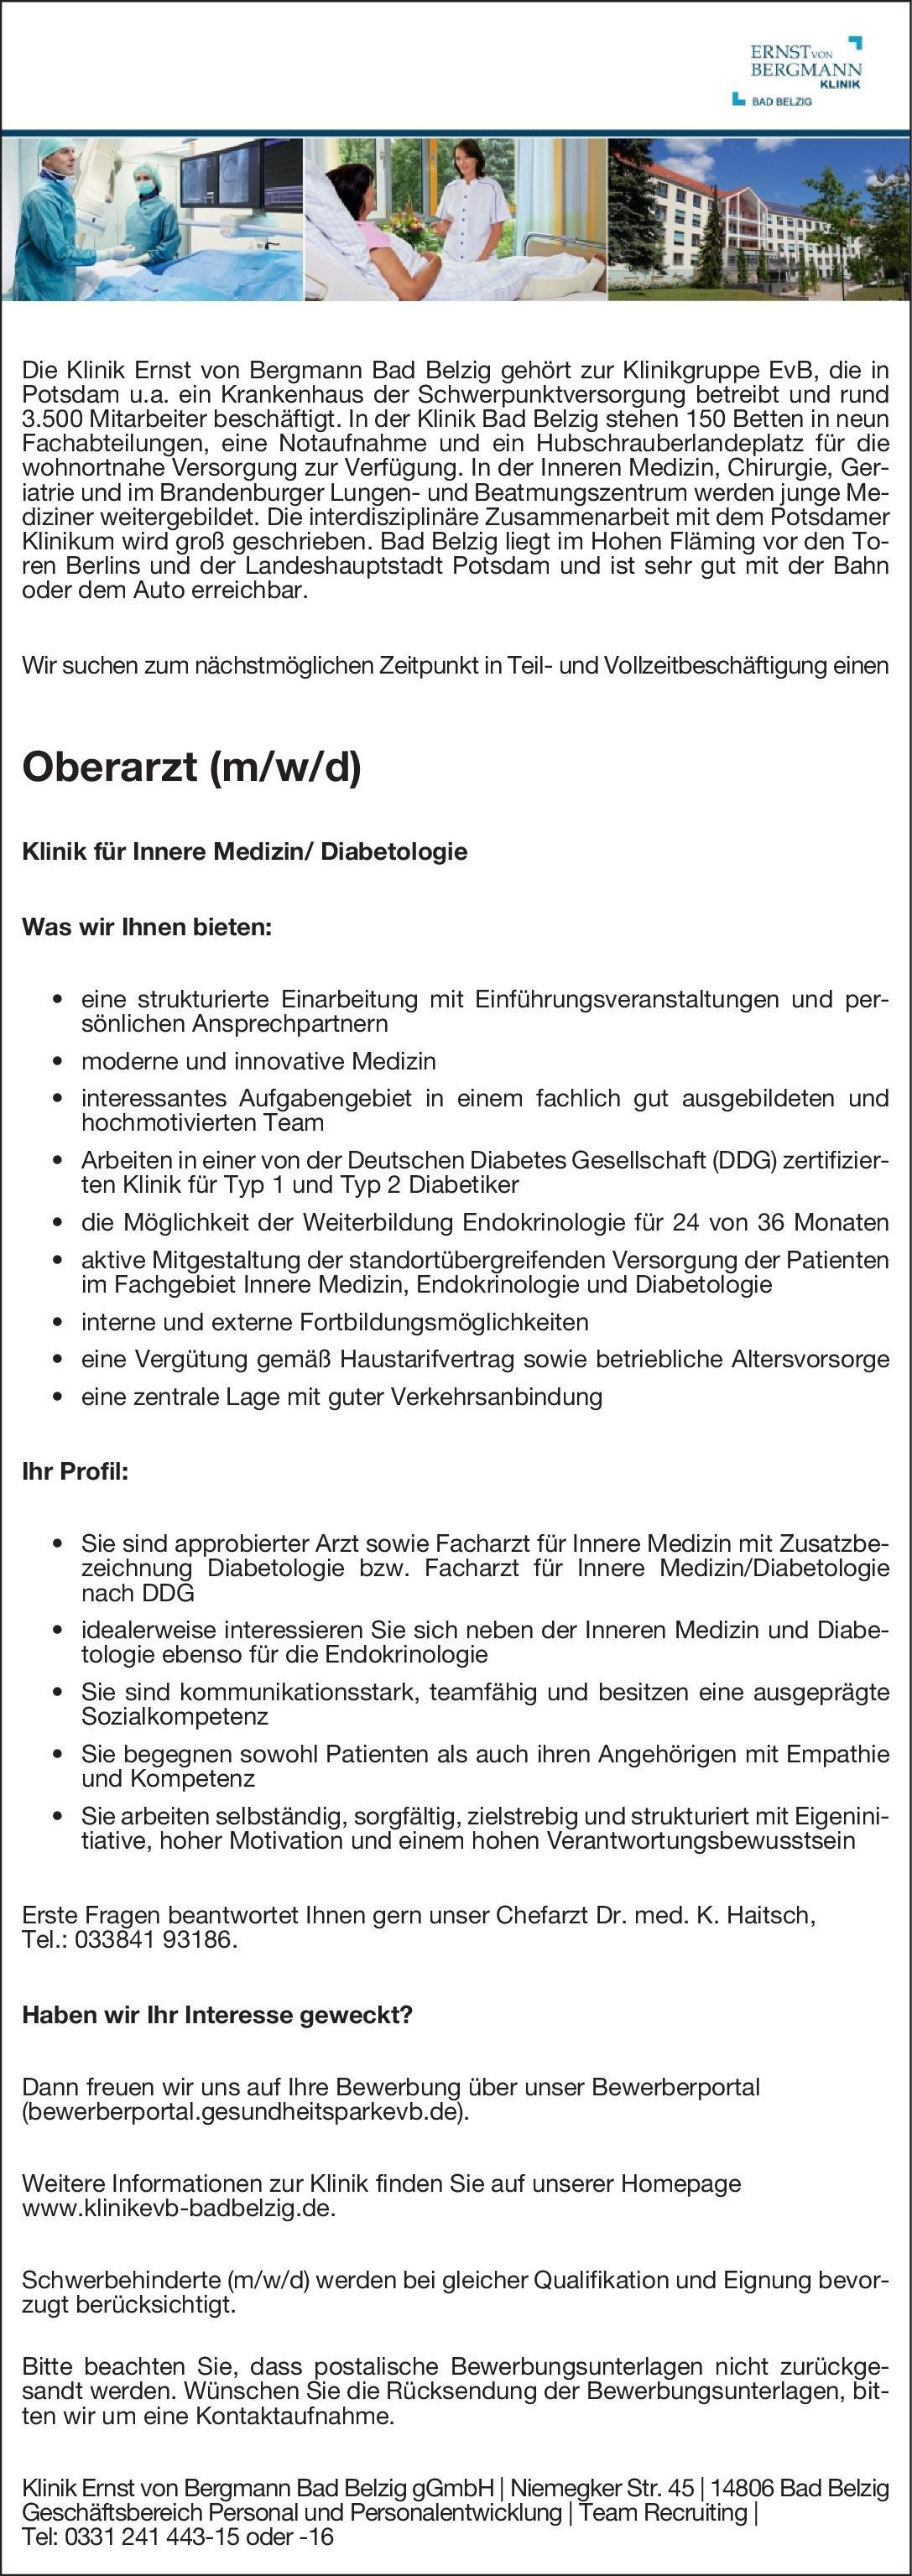 Klinik Ernst von Bergmann Bad Belzig gGmbH Oberarzt (w/d/m) Innere Medizin Oberarzt